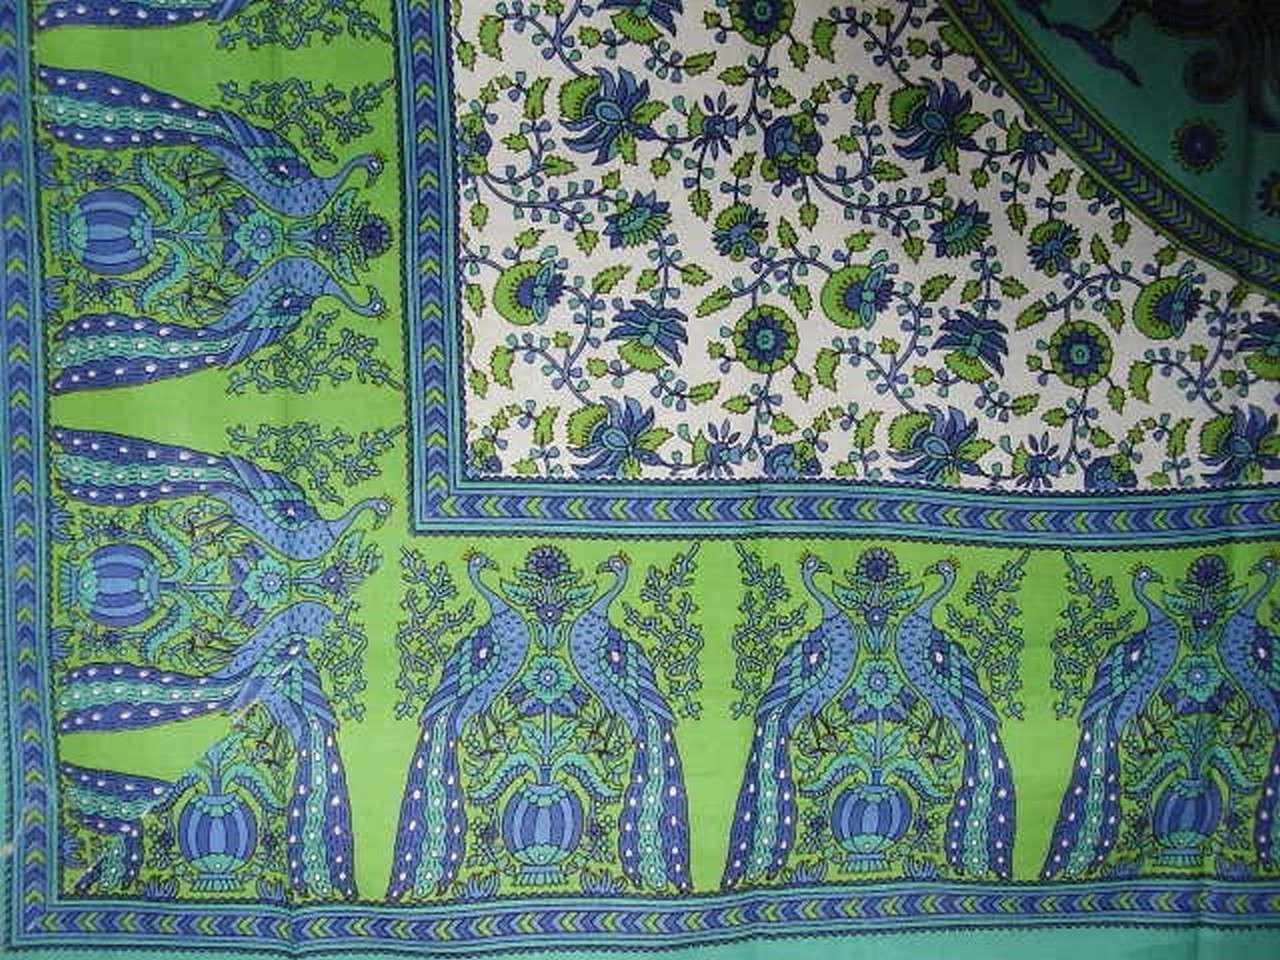 Floral Peacock Tablecloth Spr Ead Colorful Home Decor Green